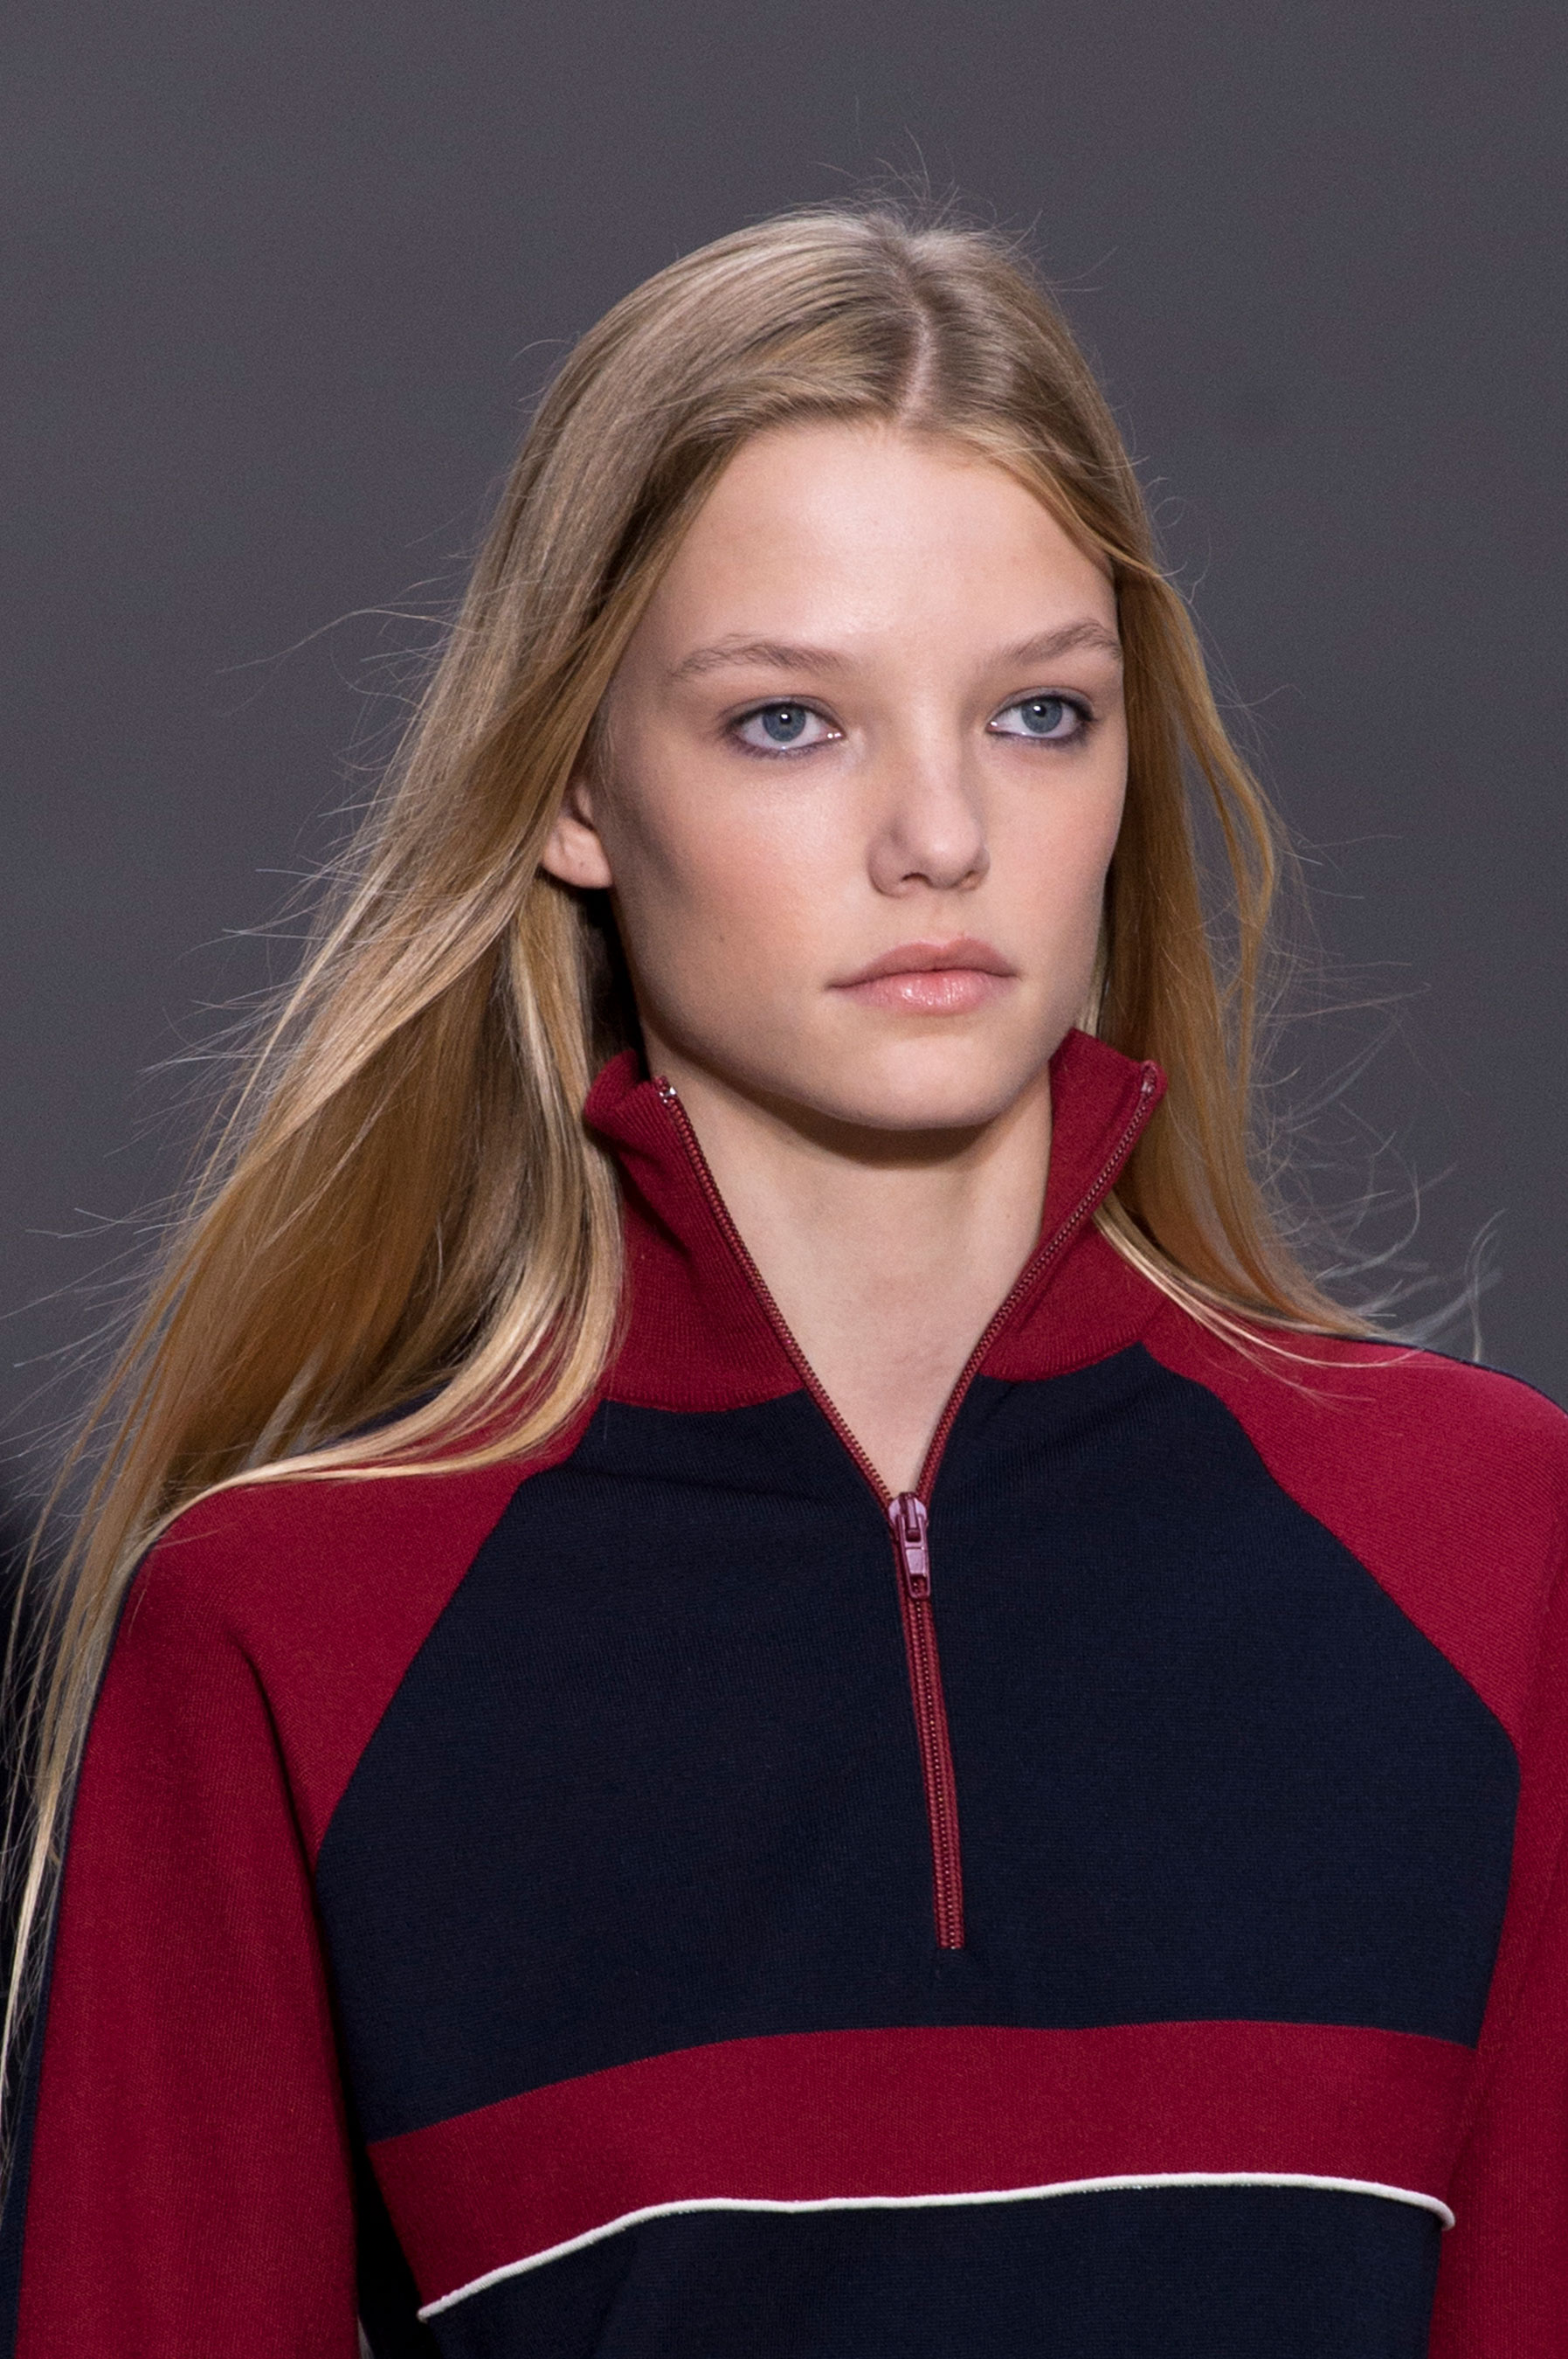 Chloe-spring-2016-runway-beauty-fashion-show-the-impression-01